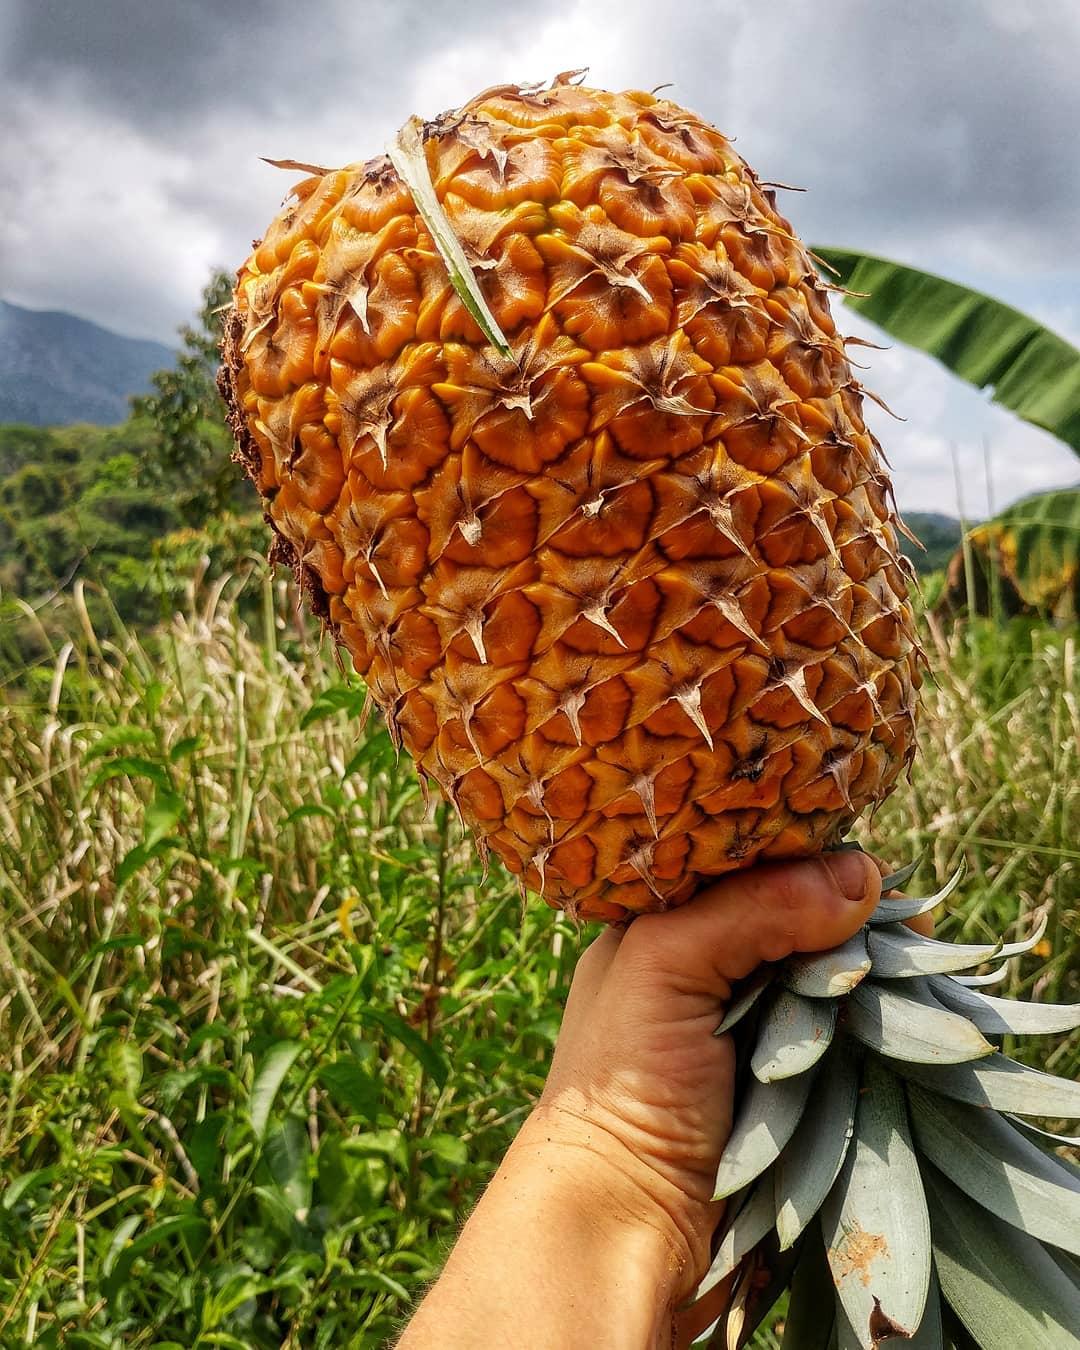 Local organic pineapple